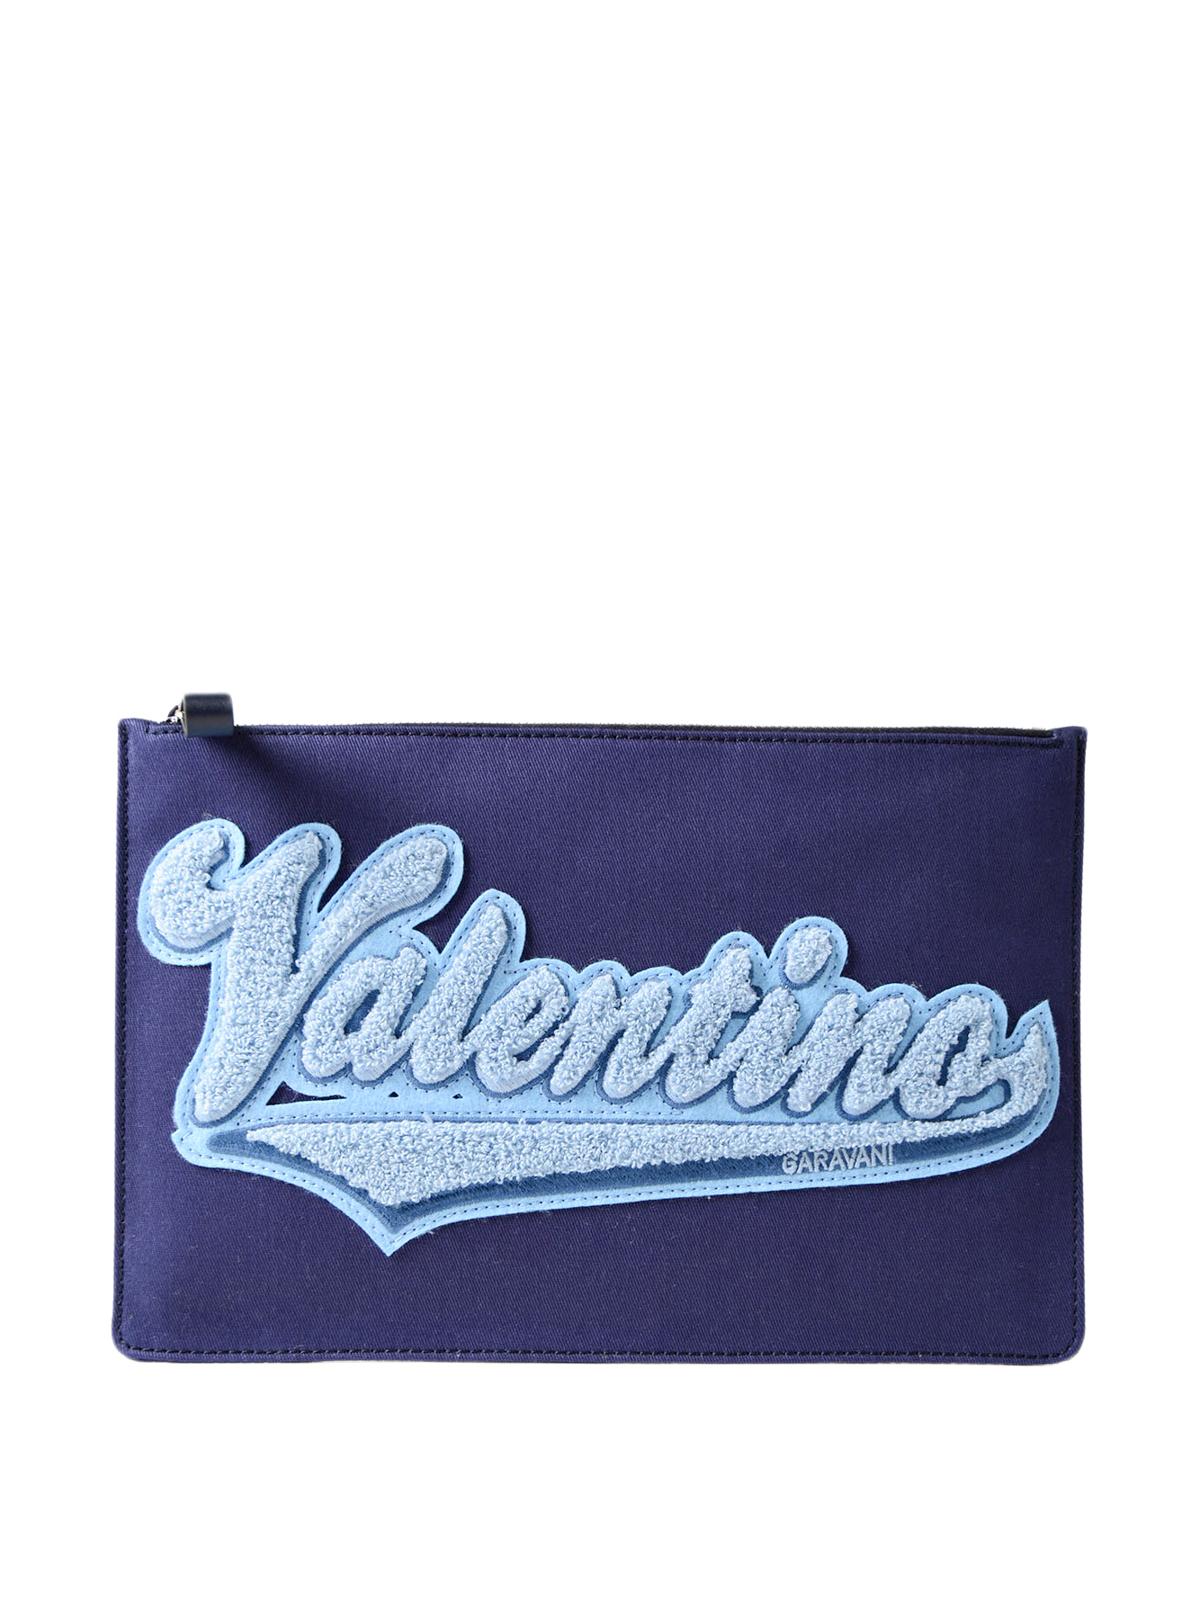 Valentino Azul Bolso Py2p0483gvrvin Garavani Clutch T1cFulKJ3